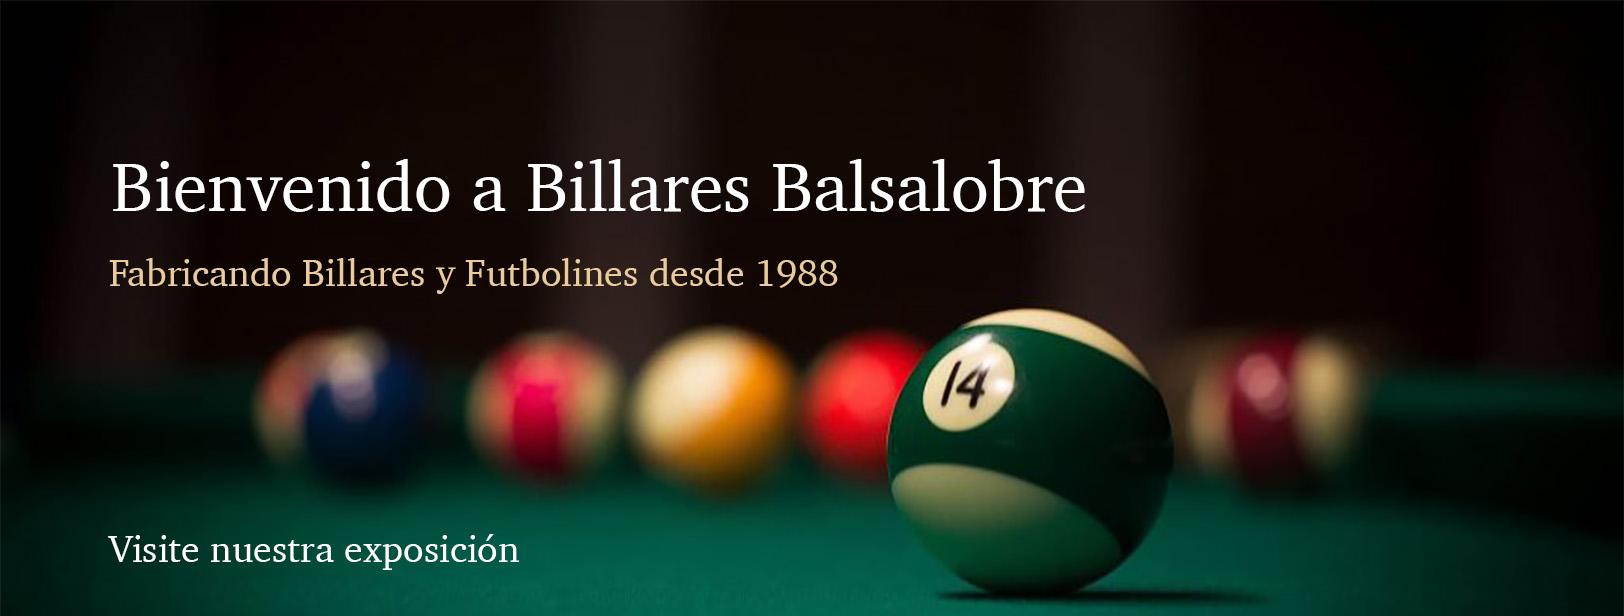 Billares Balsalobre - imagen web principal